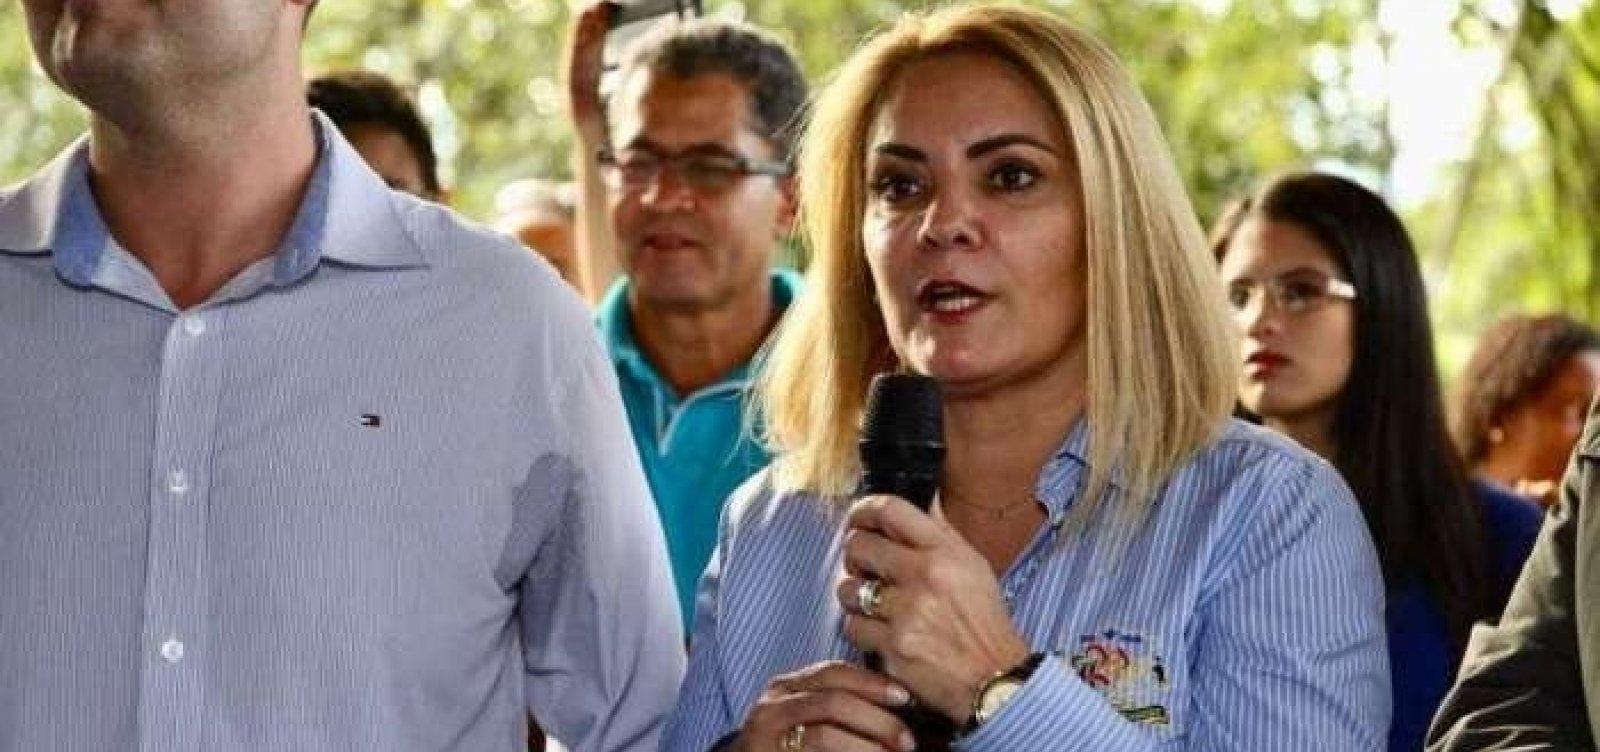 [MP-RJ intima ex-mulher de Bolsonaro a depor sobre 'rachadinha' no gabinete de Carlos Bolsonaro]